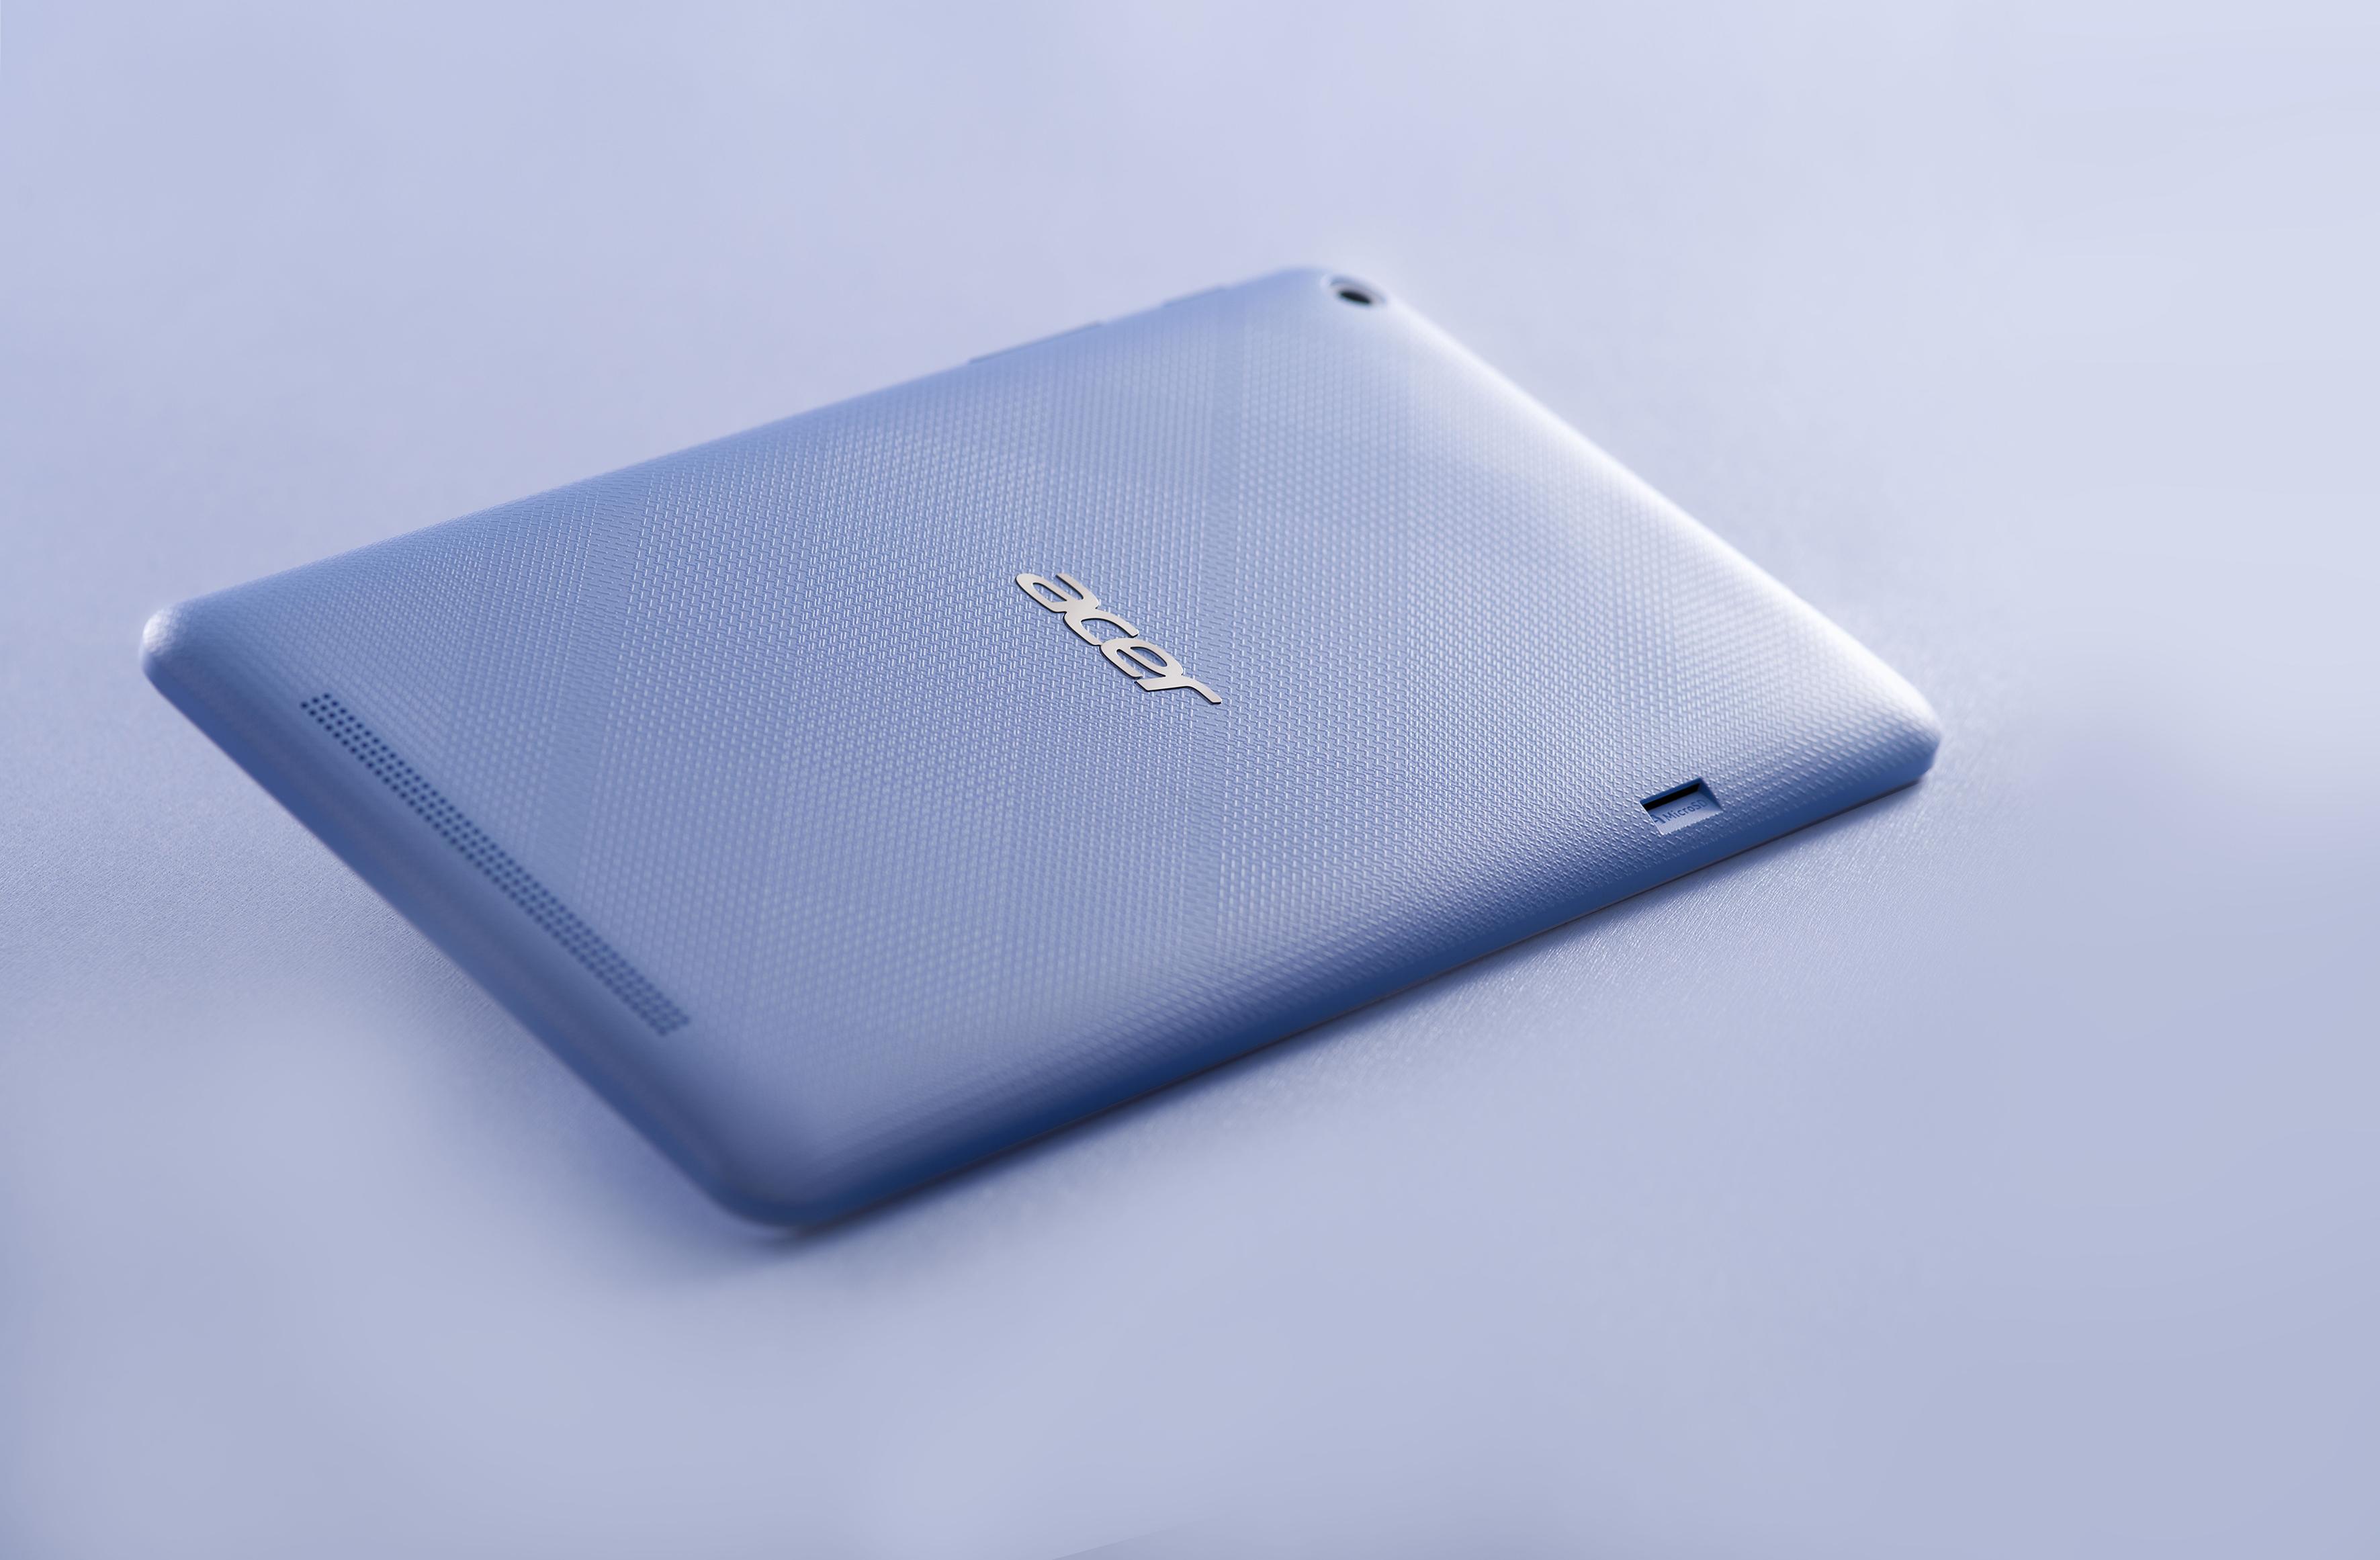 Acer annonce une Iconia One 8 sous Lollipop